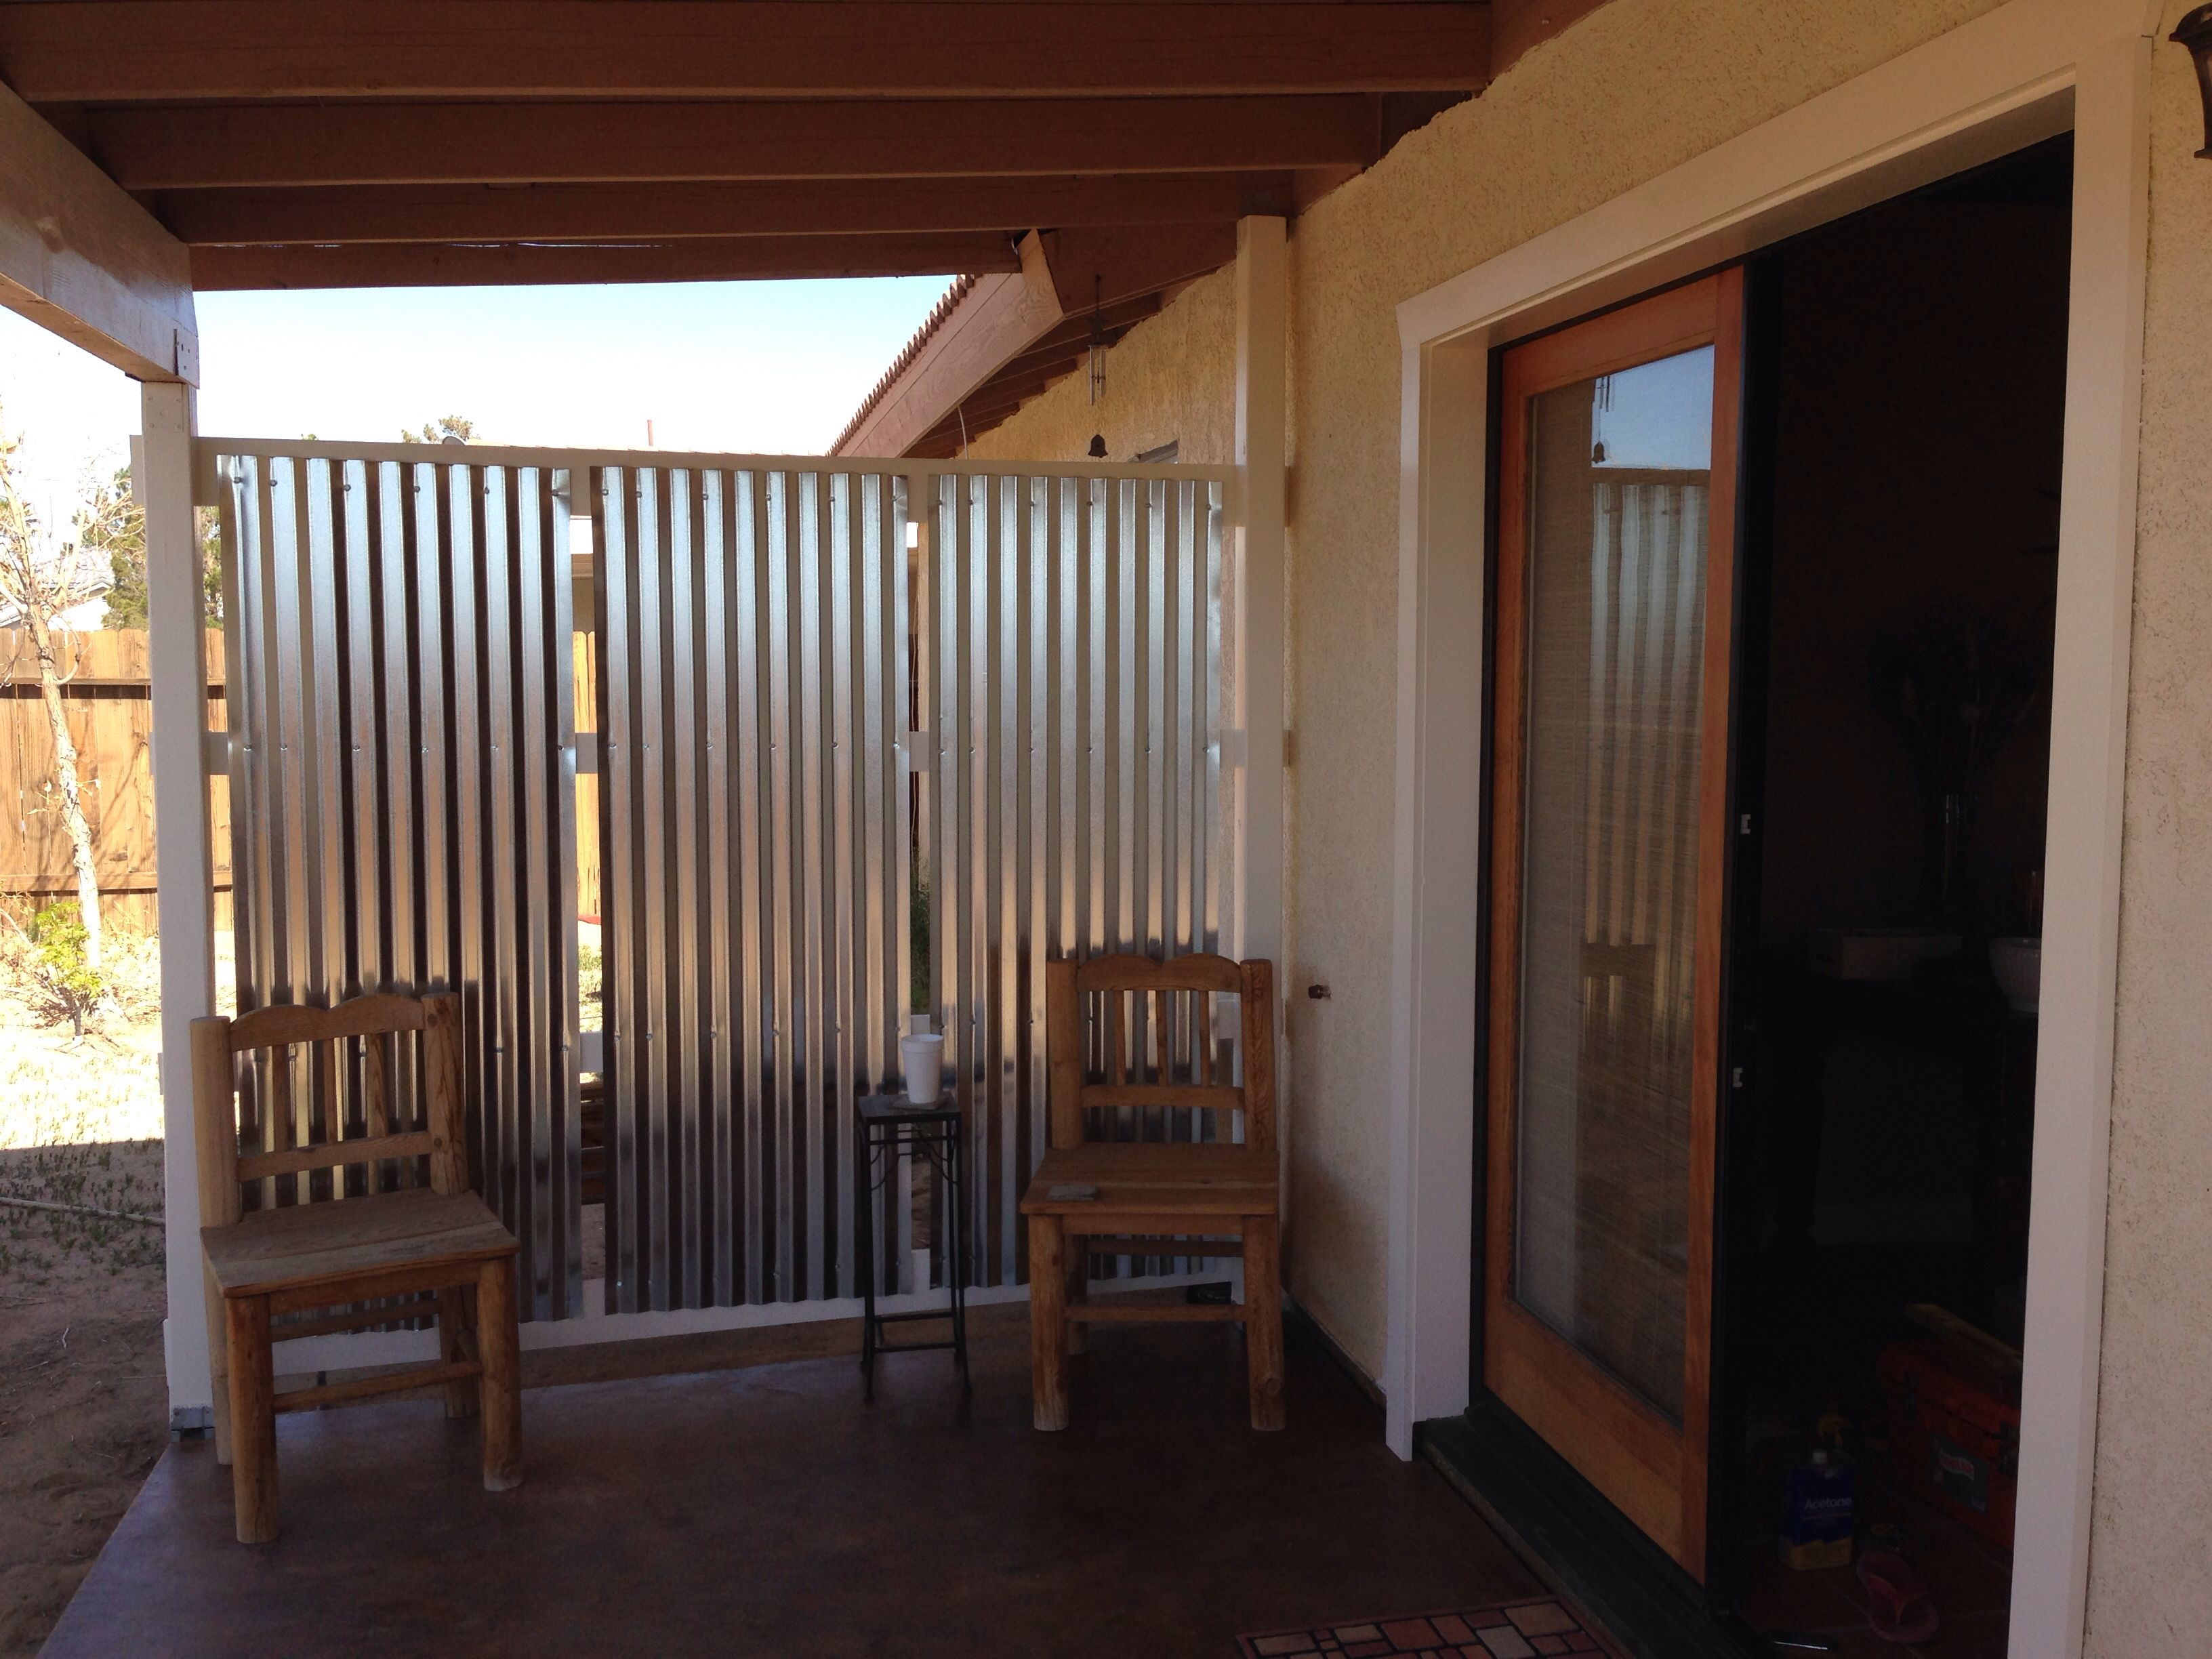 Diy Corrugated Privacy Screen And Wind Break Backyard